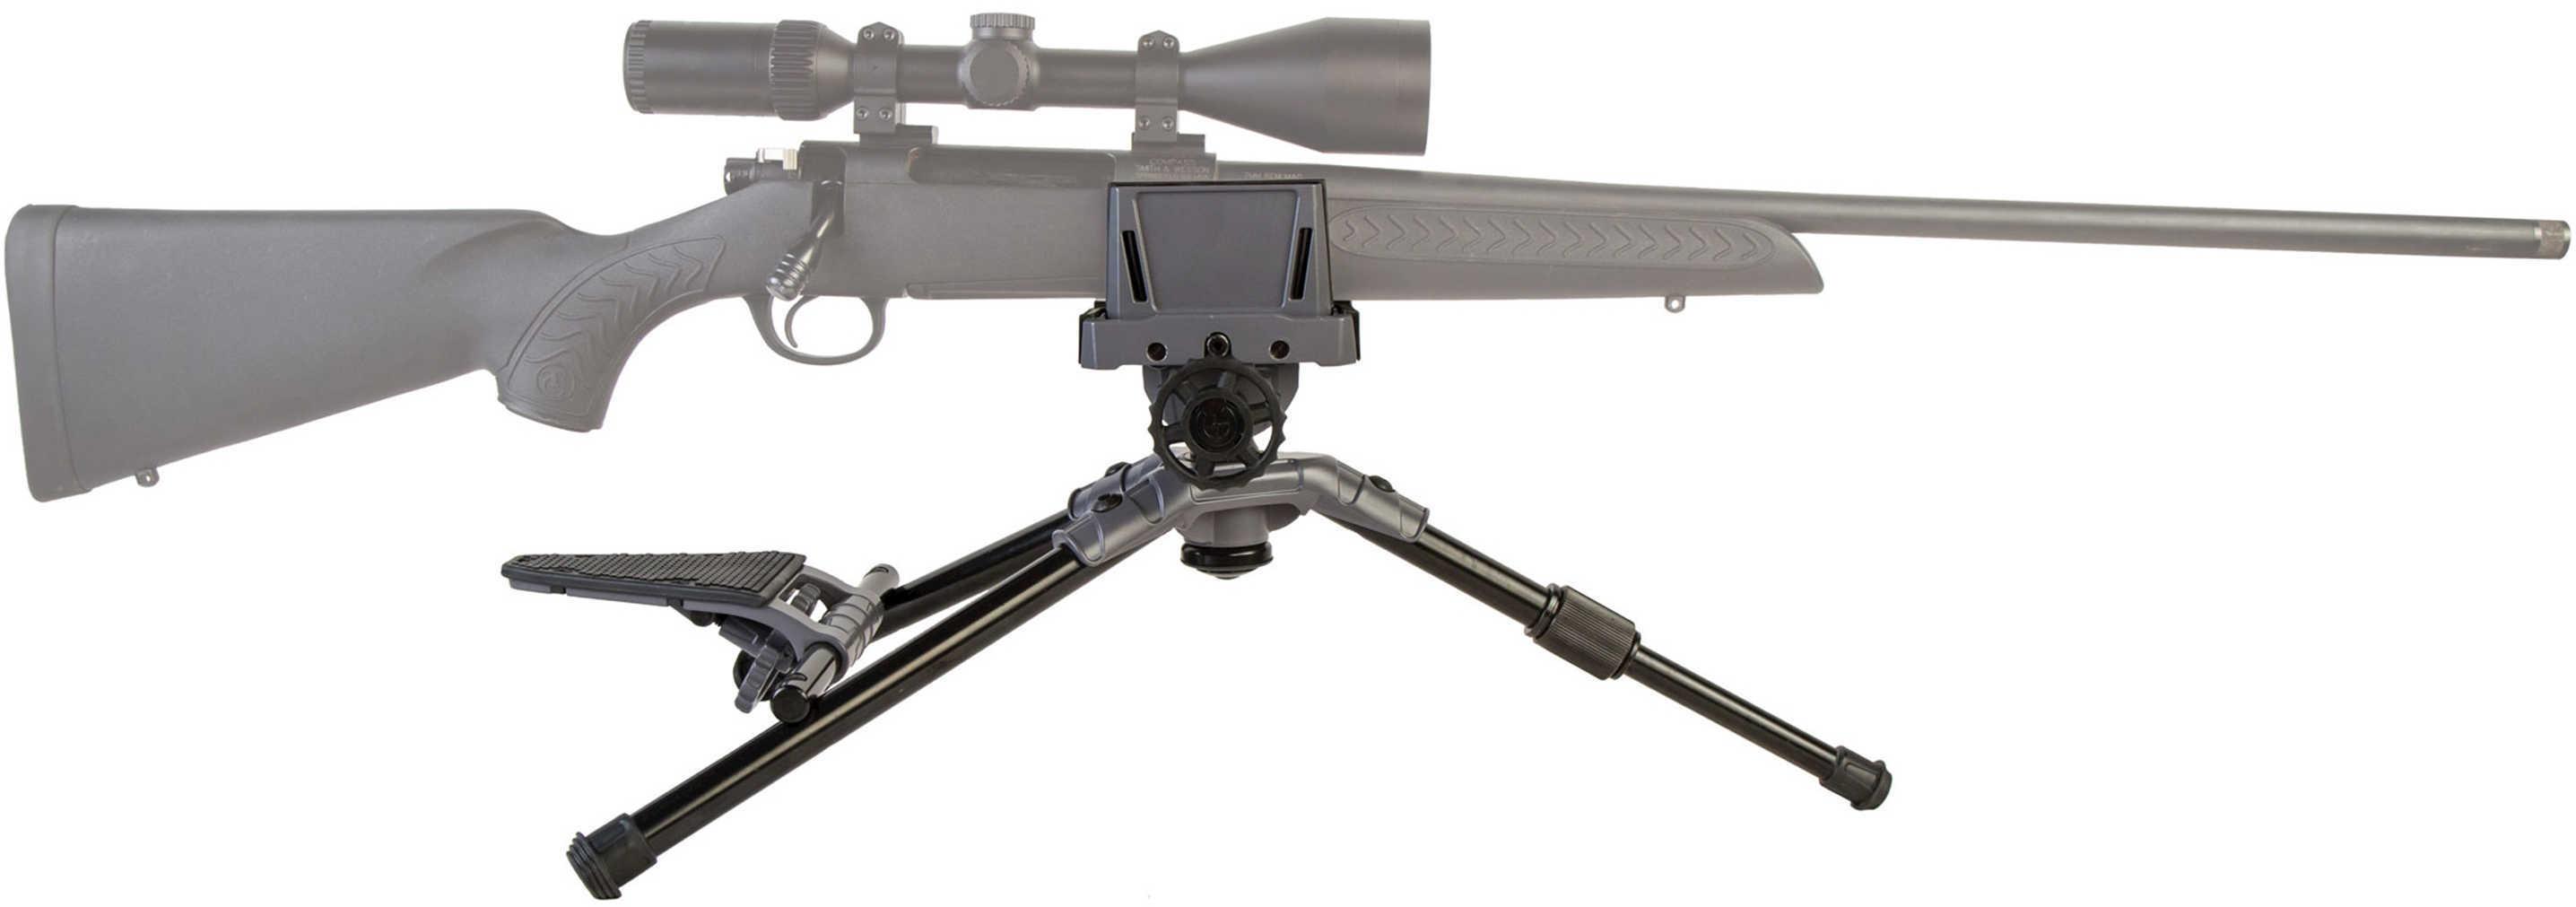 "Caldwell 821400 Precision Turret Shooting Rest Aluminum Black 22.4"" Long"